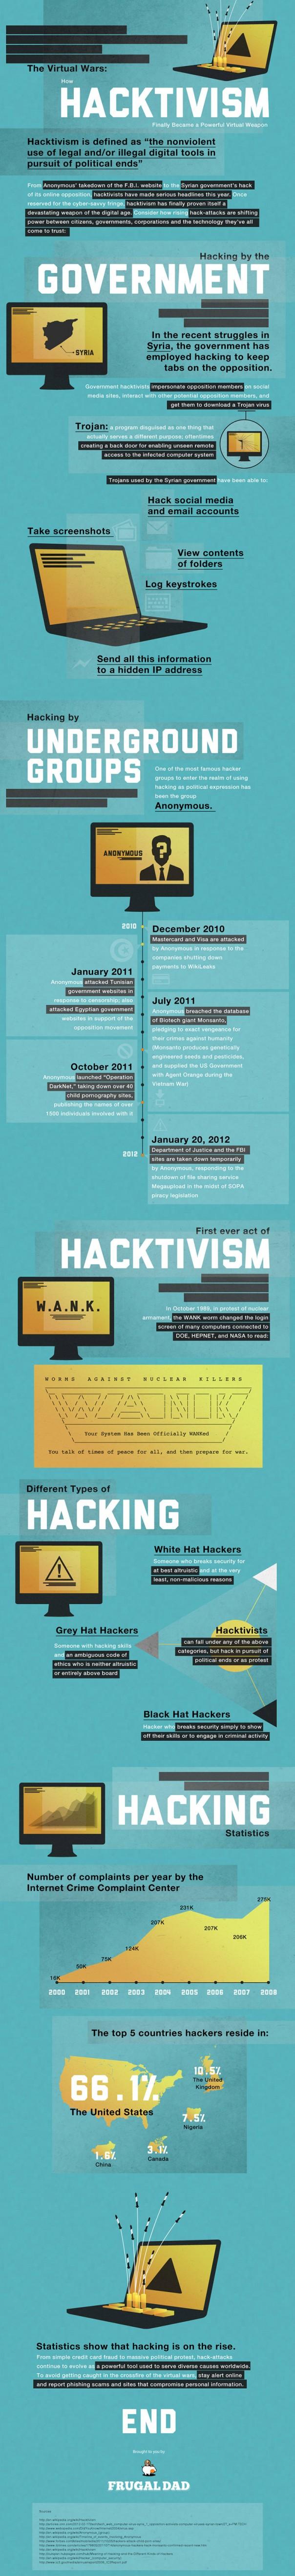 L'histoire de l'hacktivisme